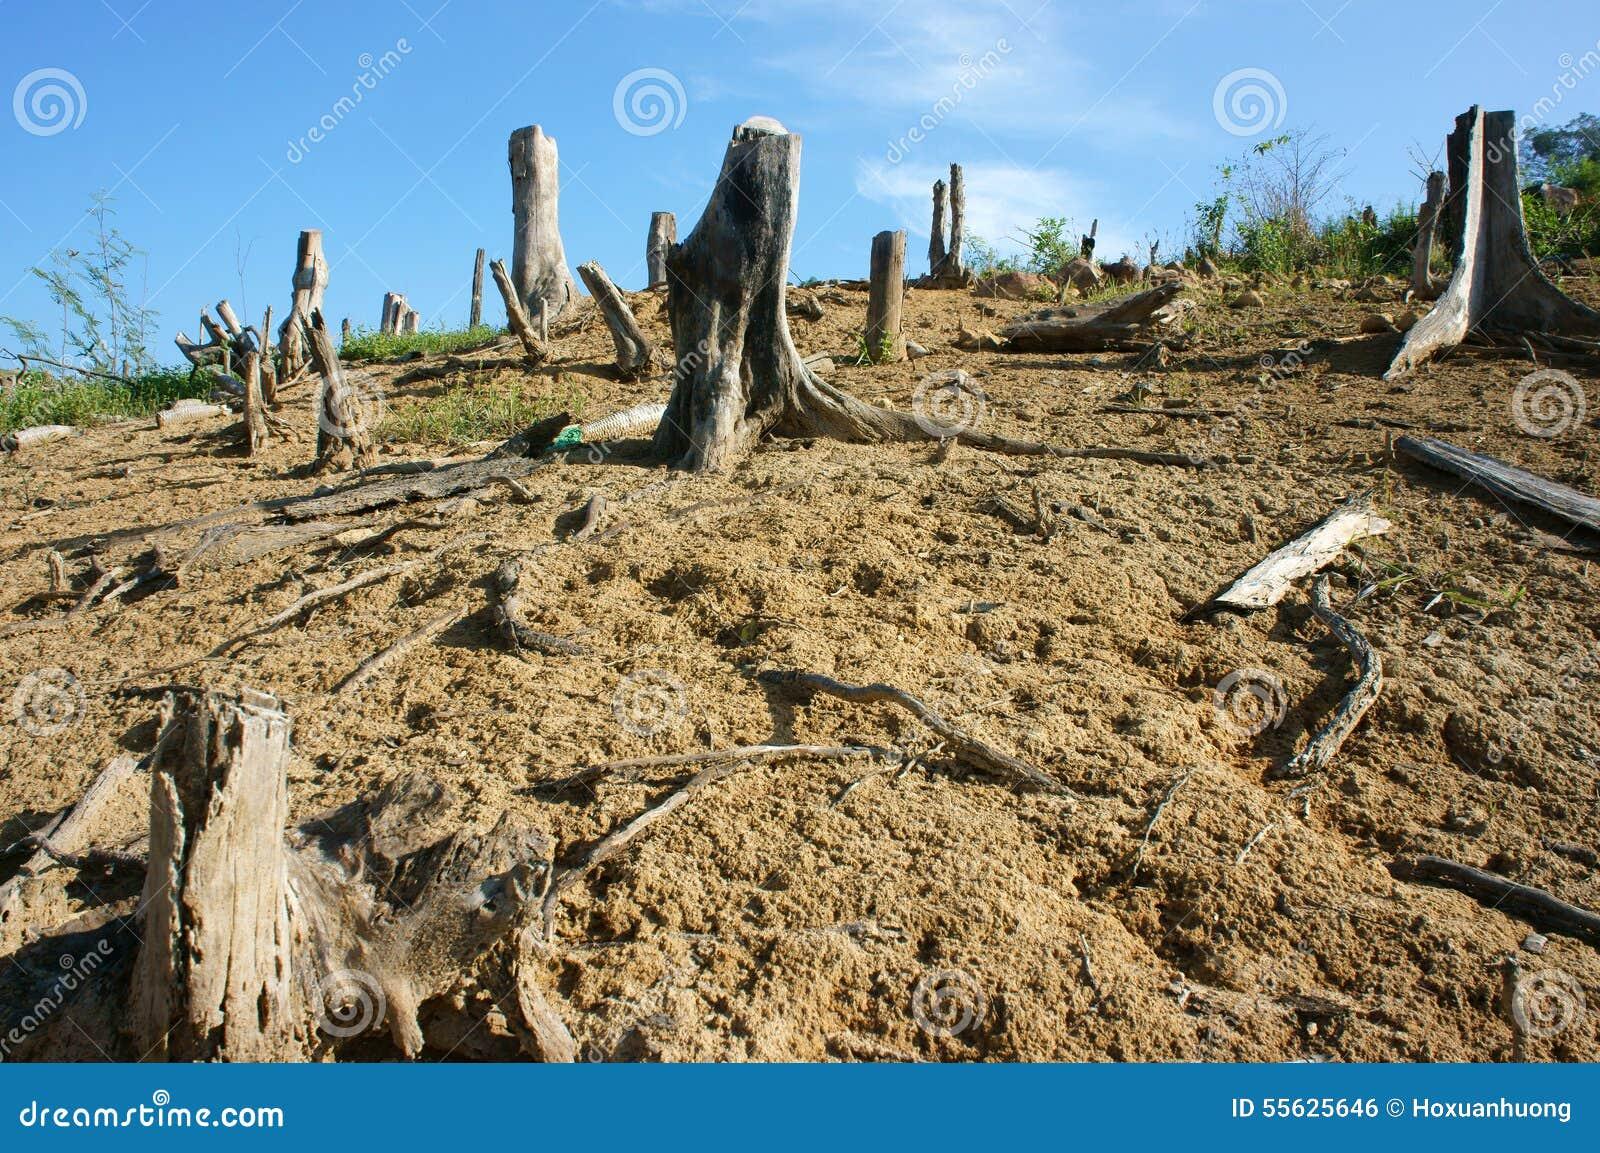 Deforestation, stump, change climate, living environment